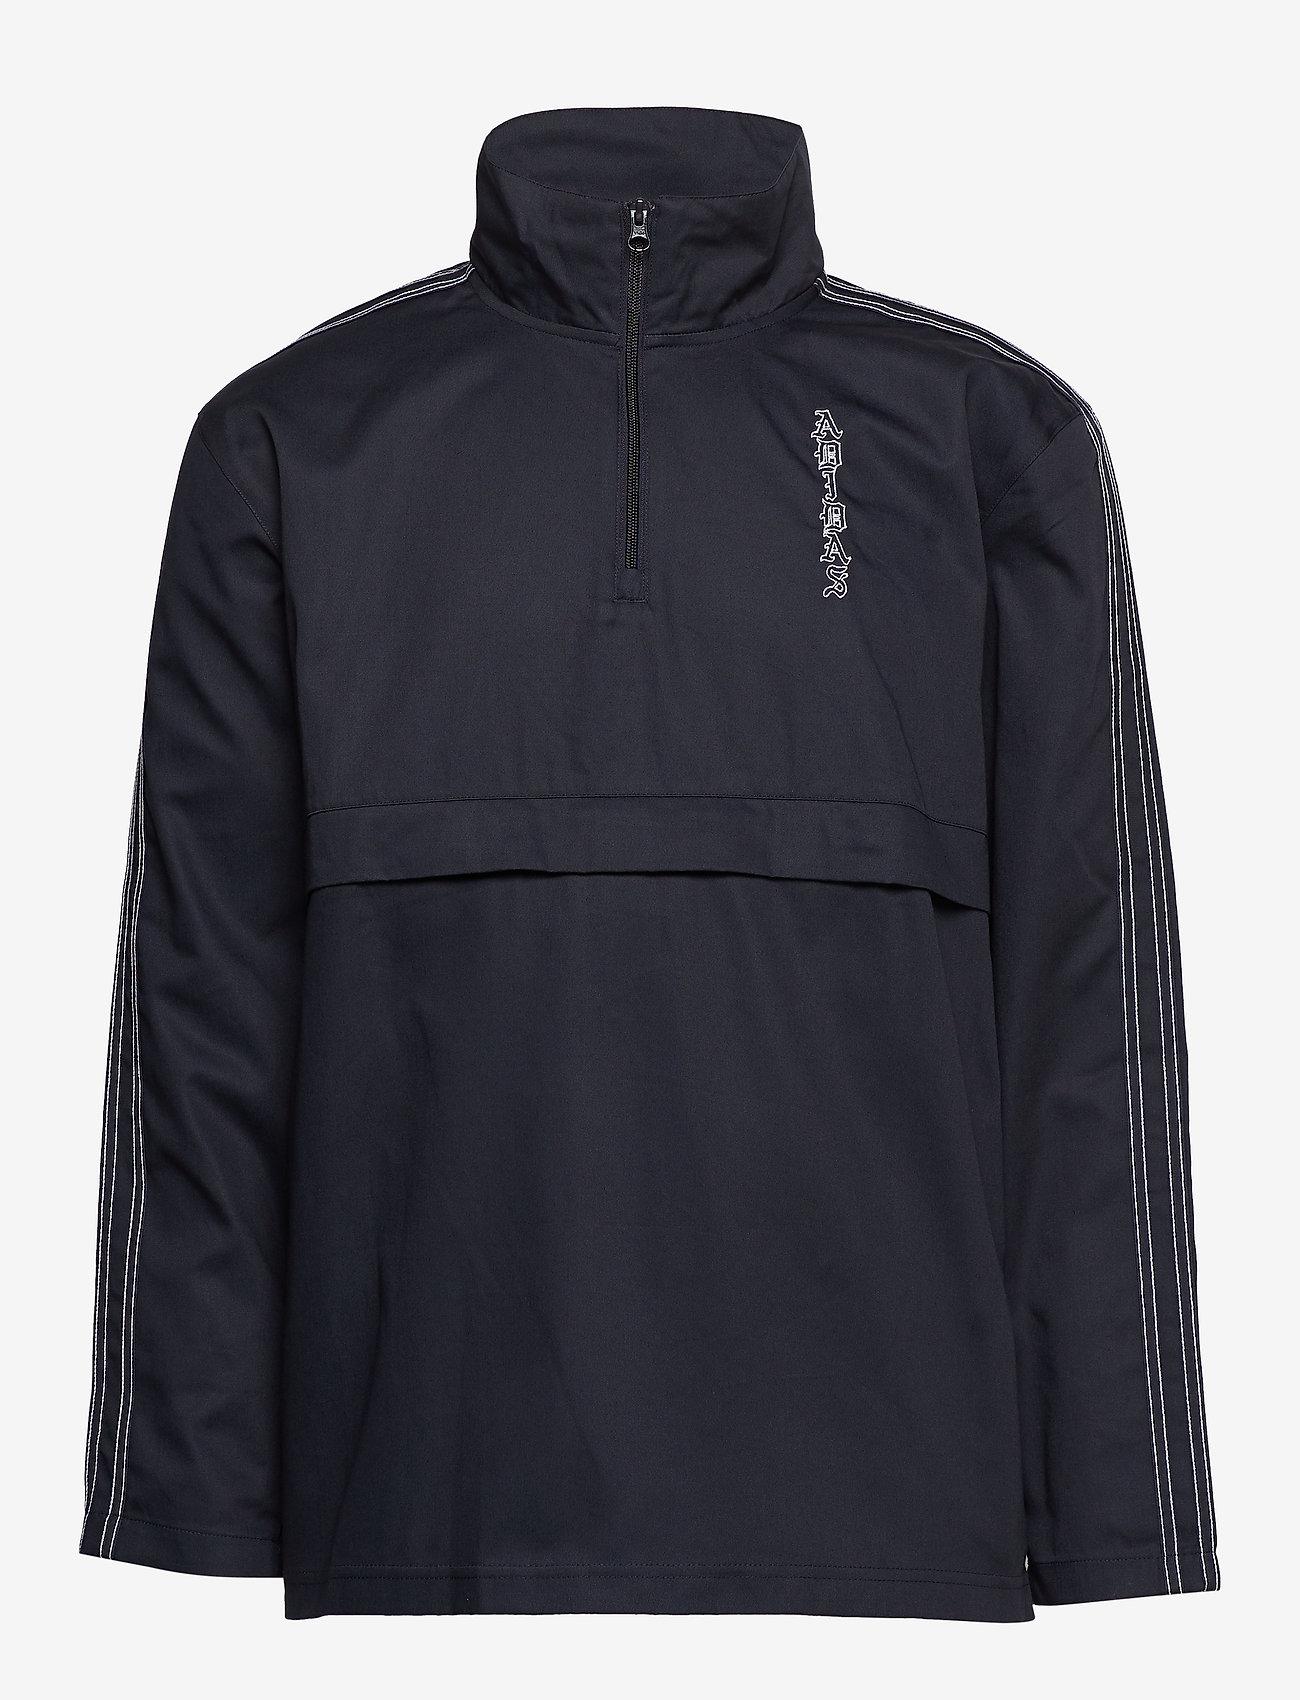 Manolesjacket (Ntgrey/white) - adidas Performance jd9Ql8